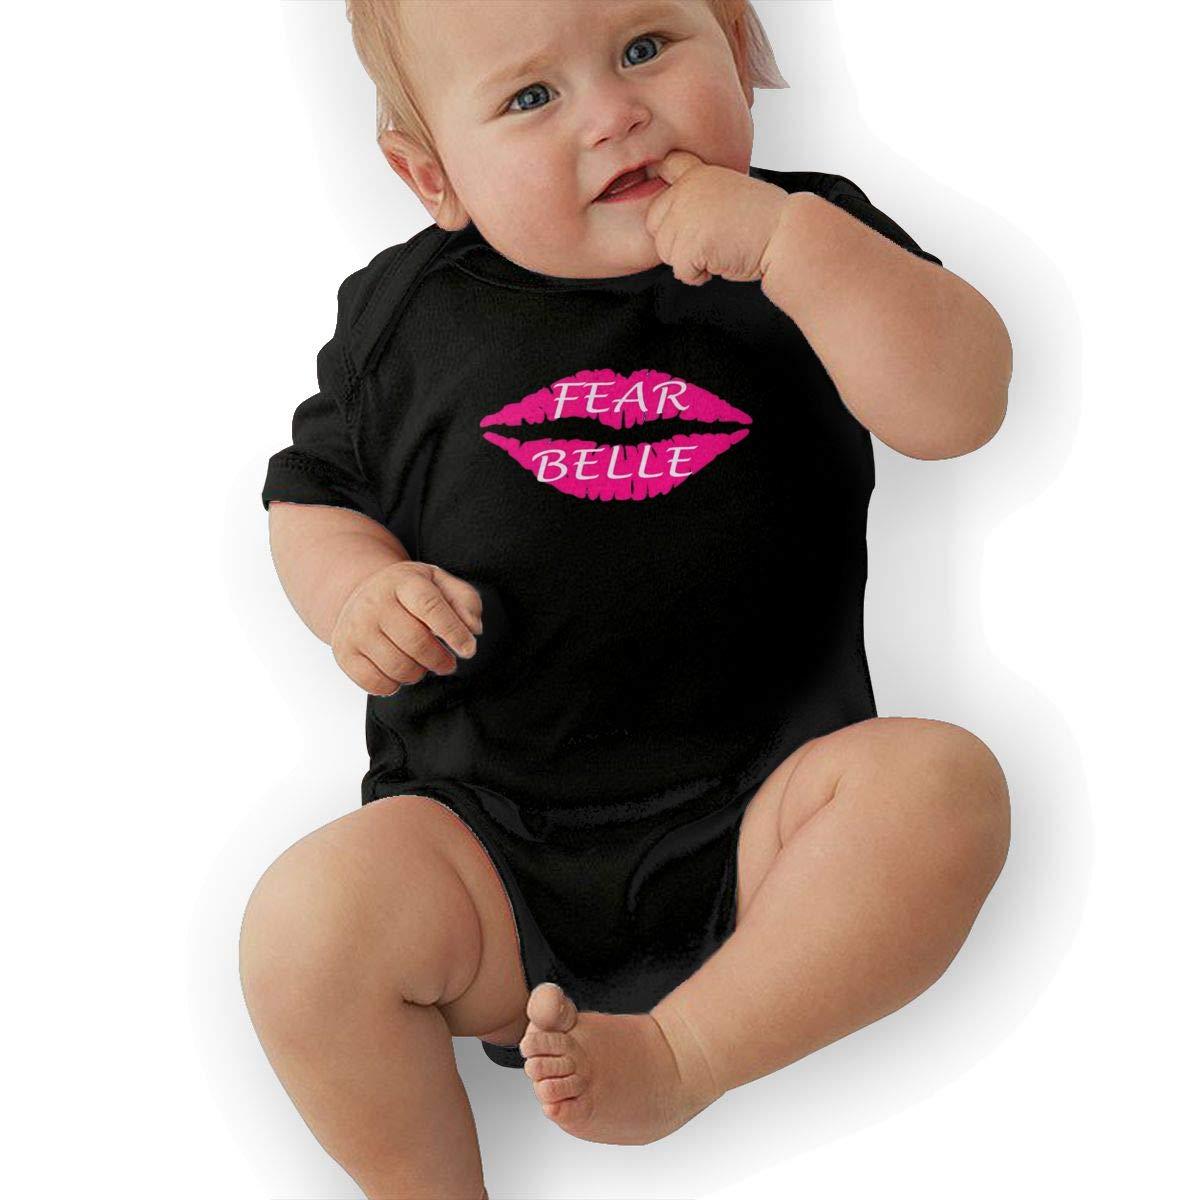 Dfenere BelleLove Merch Hip Hop Newborn Baby Short Sleeve Bodysuit Romper Infant Summer Clothing